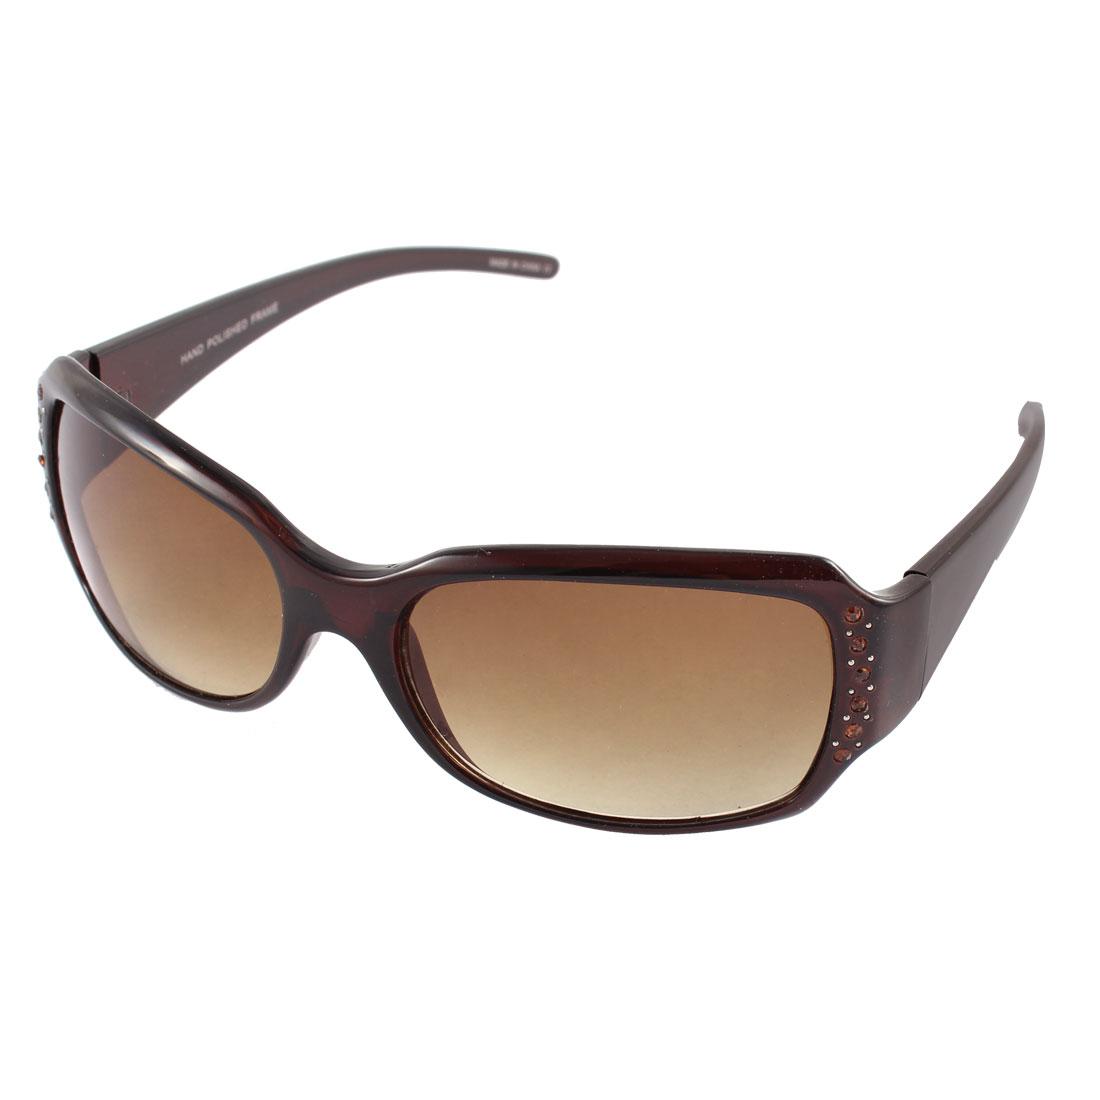 Plastic Single Bridge Sun Protection Sunglasses Eyewear Black for Lady